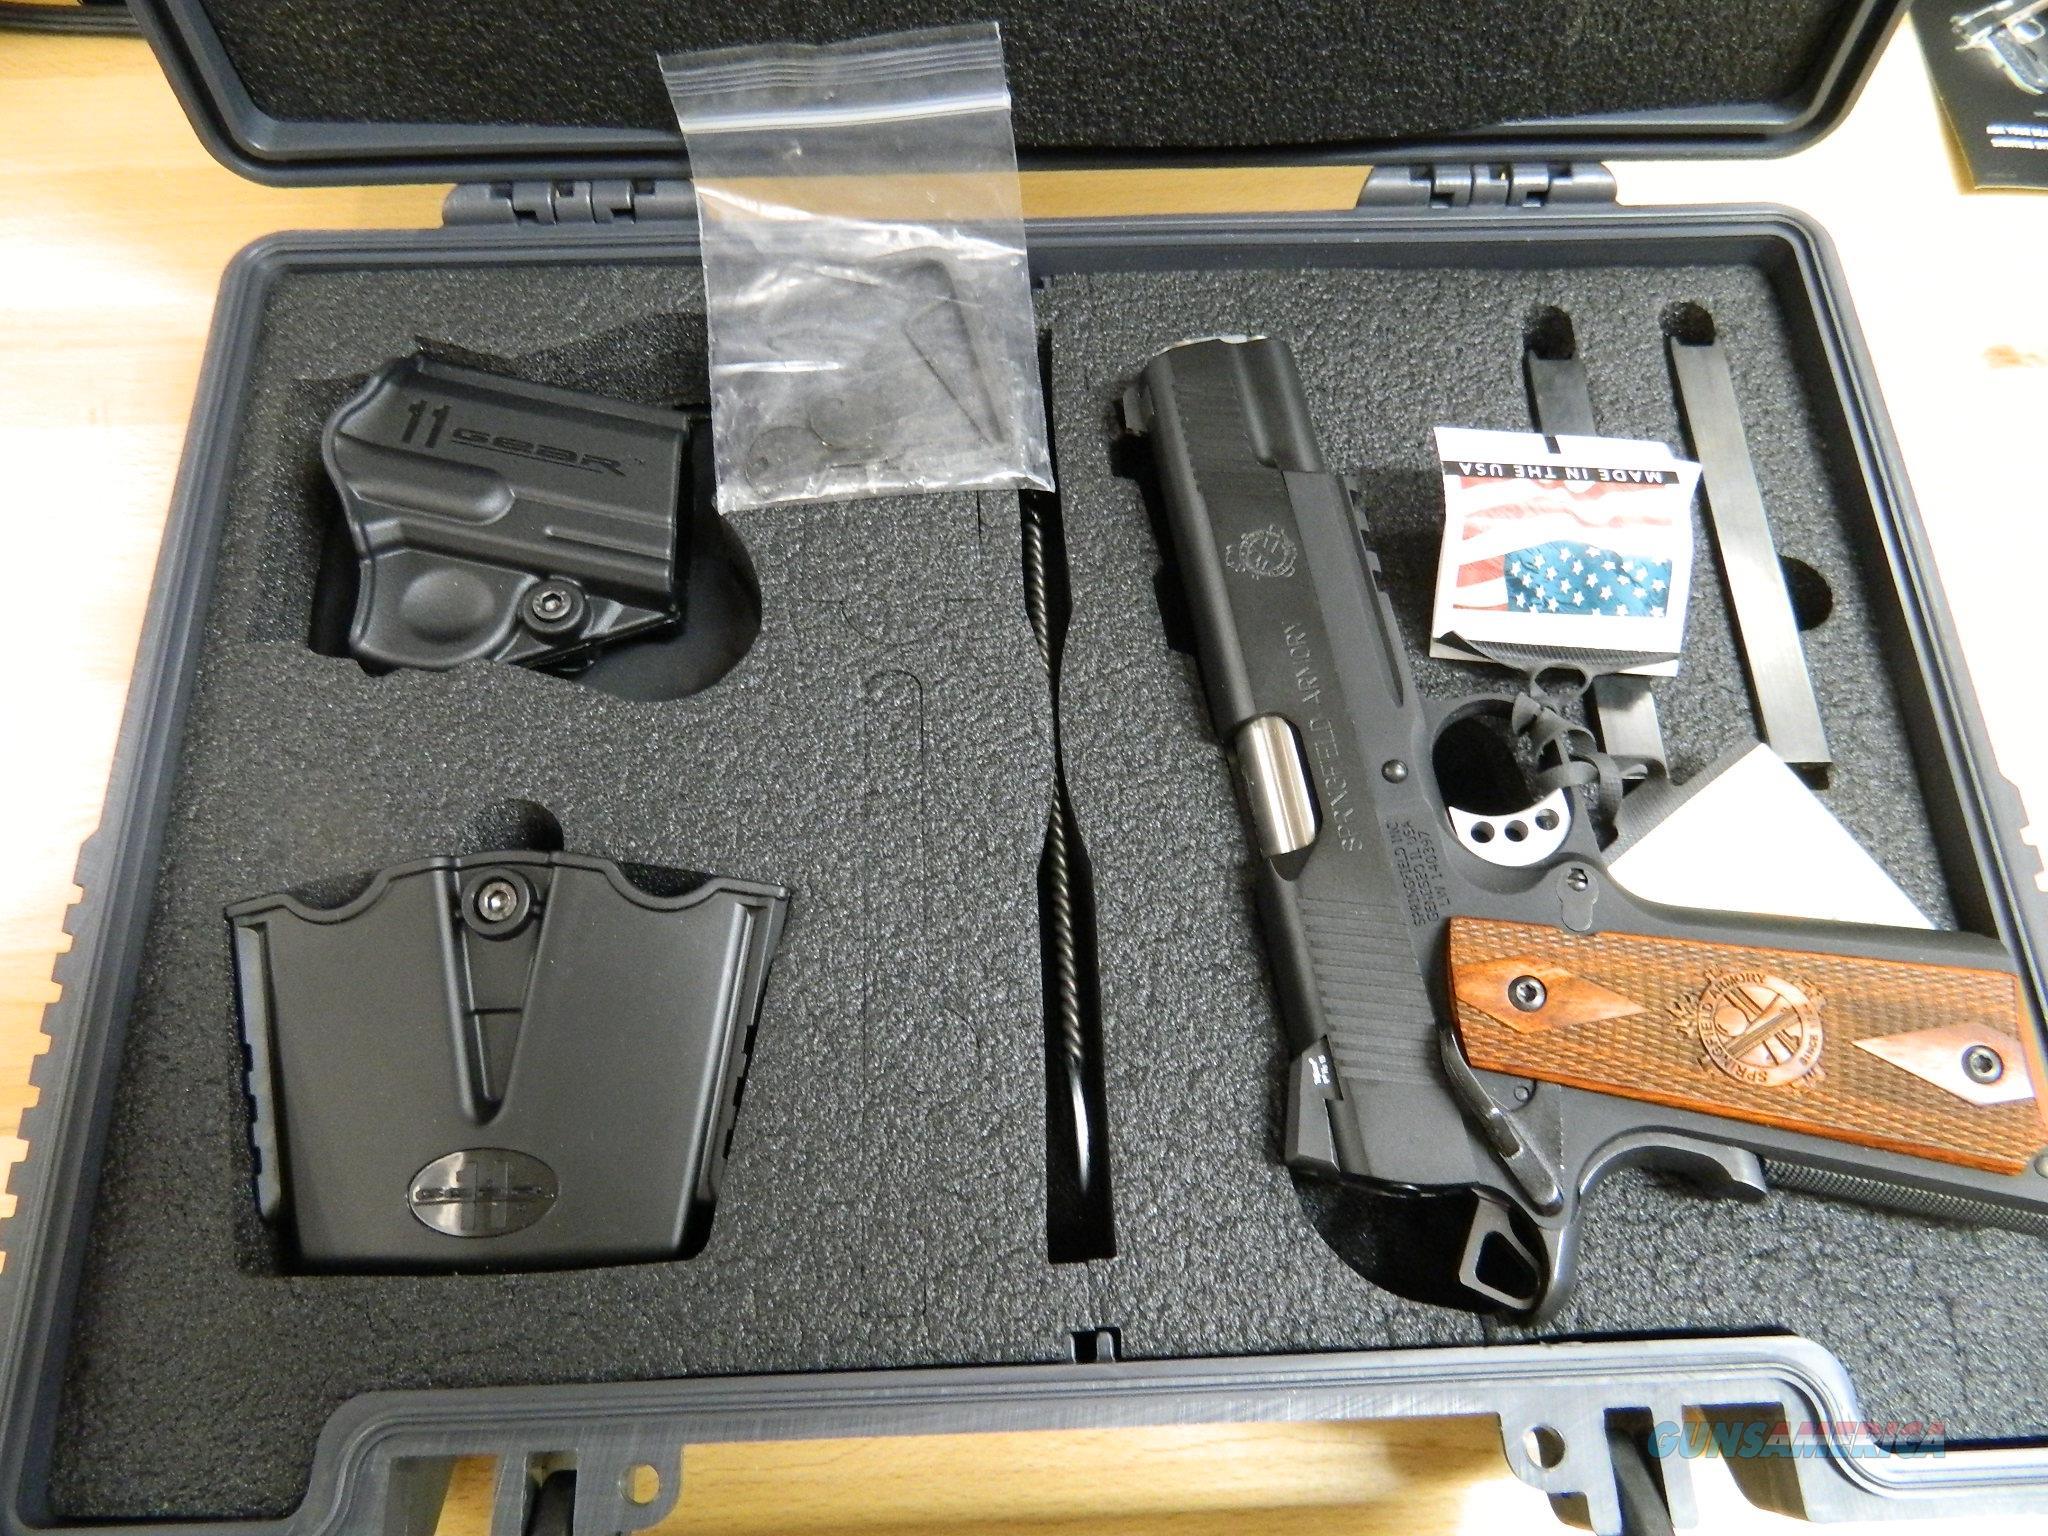 Springfield 1911 Lightweight Operator .45ACP  Guns > Pistols > Springfield Armory Pistols > 1911 Type